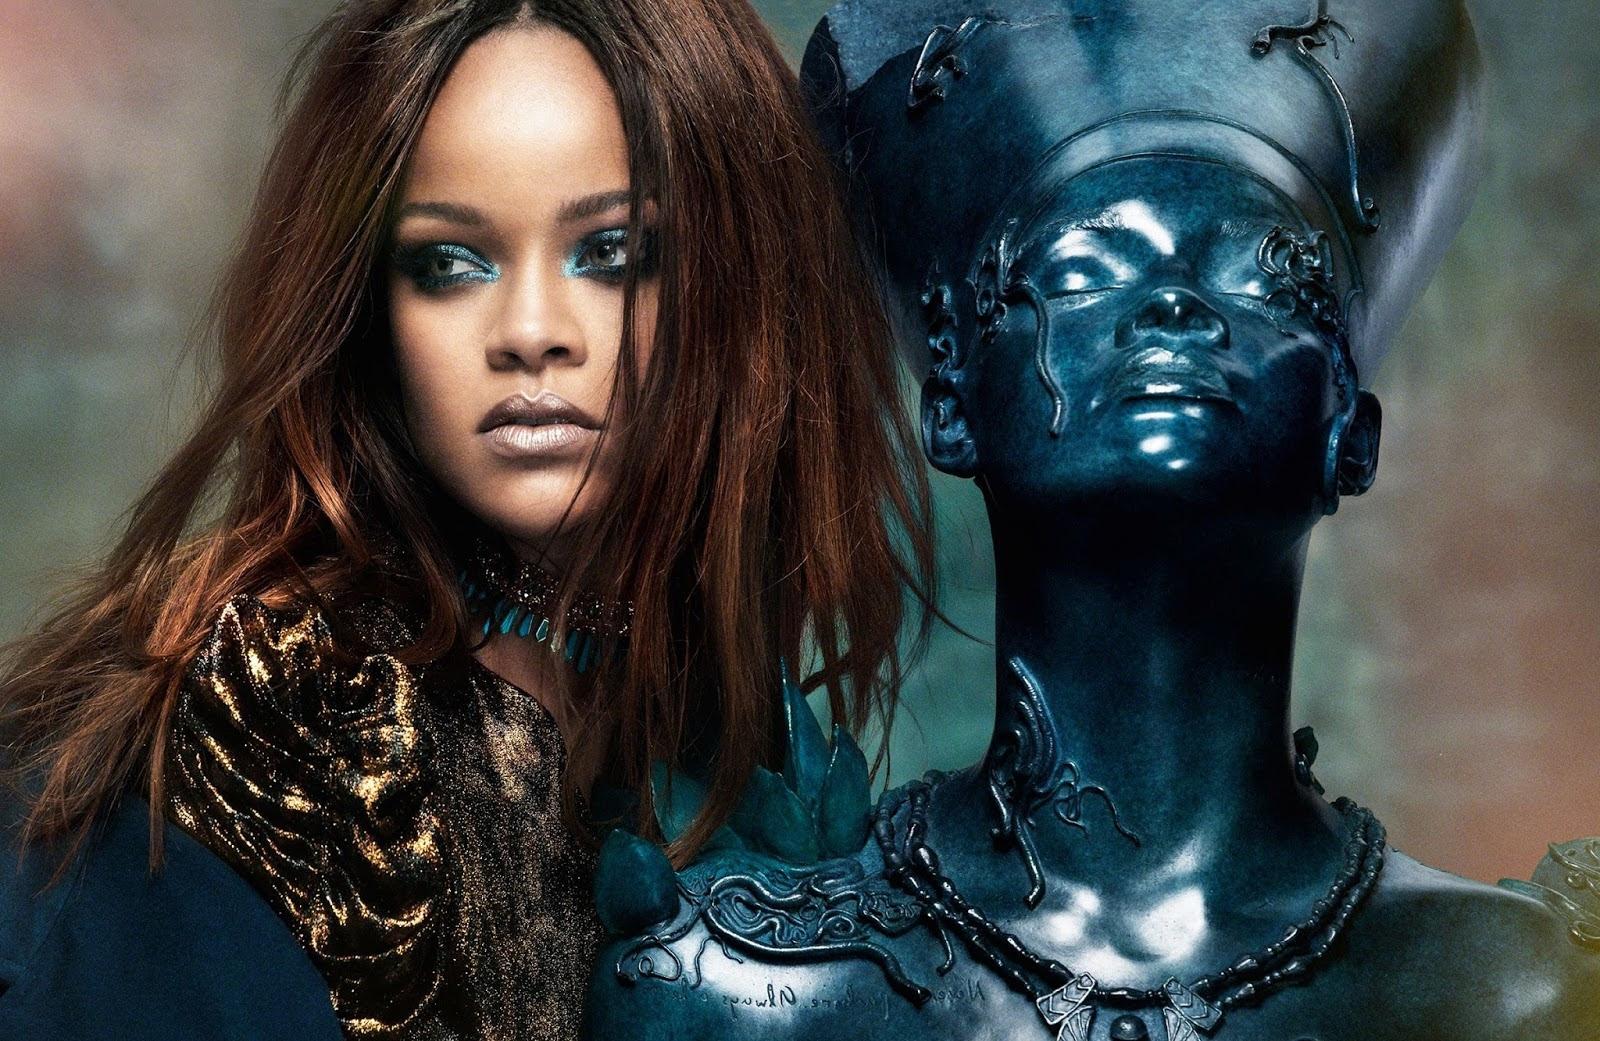 f515276cf37986 Les plus belles photos de Rihanna - Maquillage.com